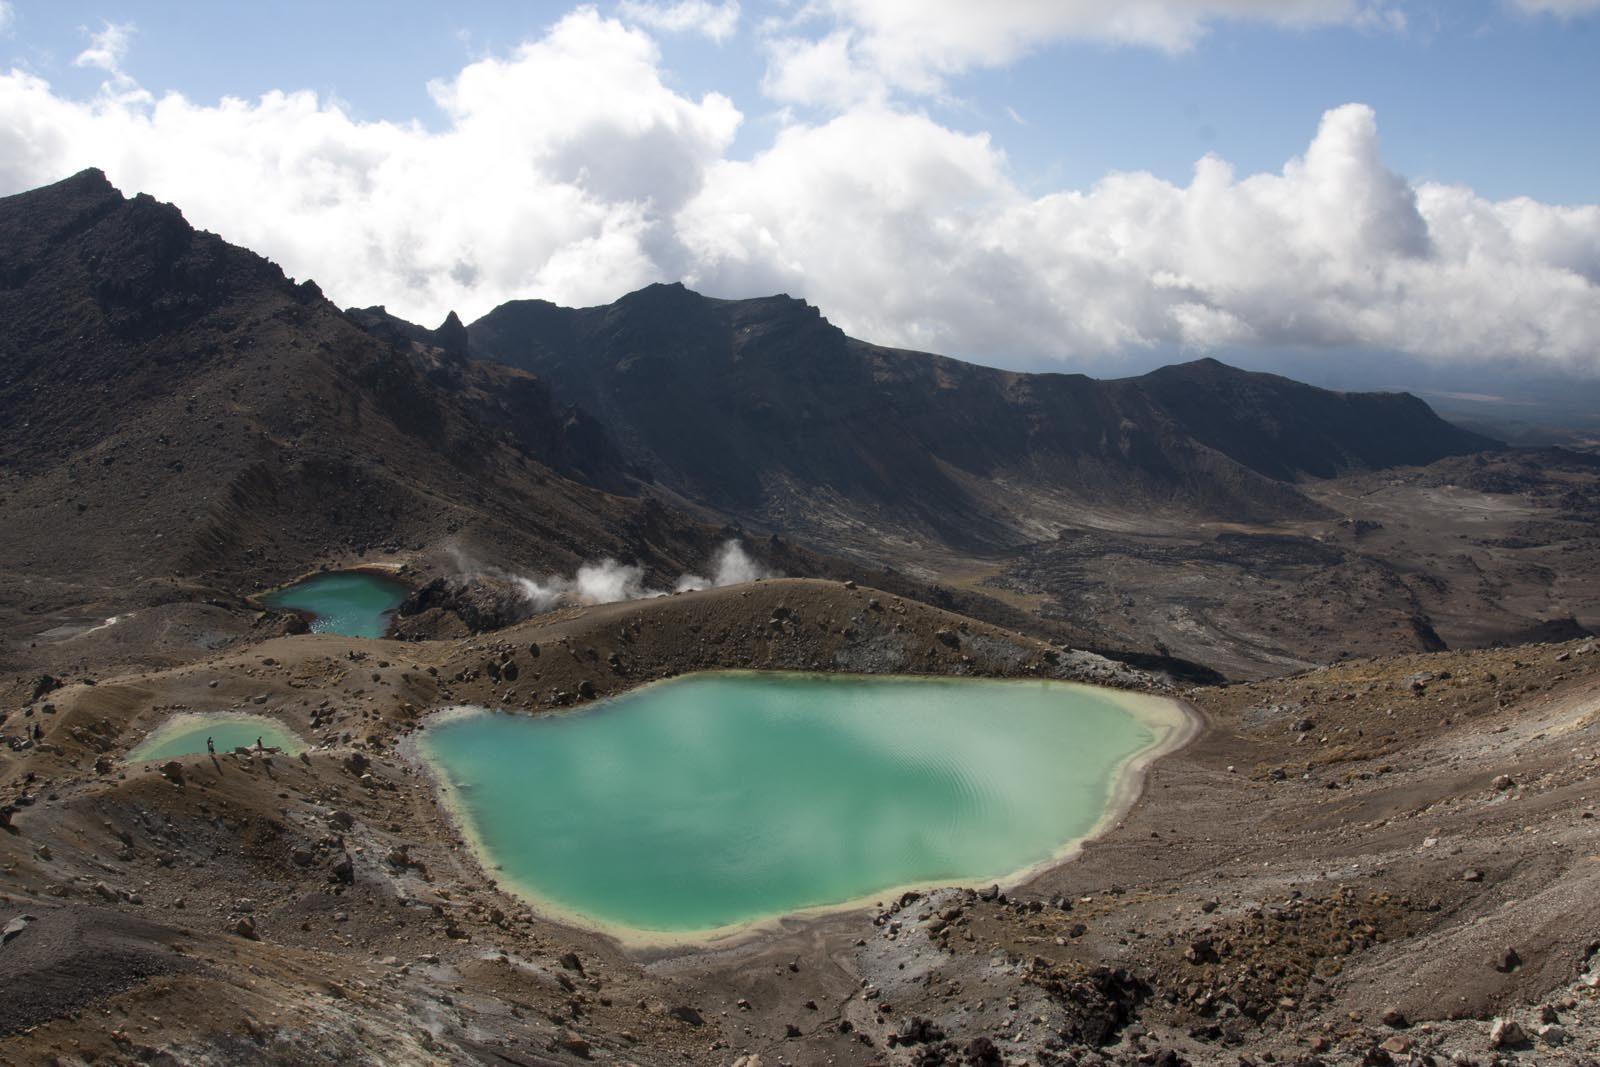 Emeraldová jezera